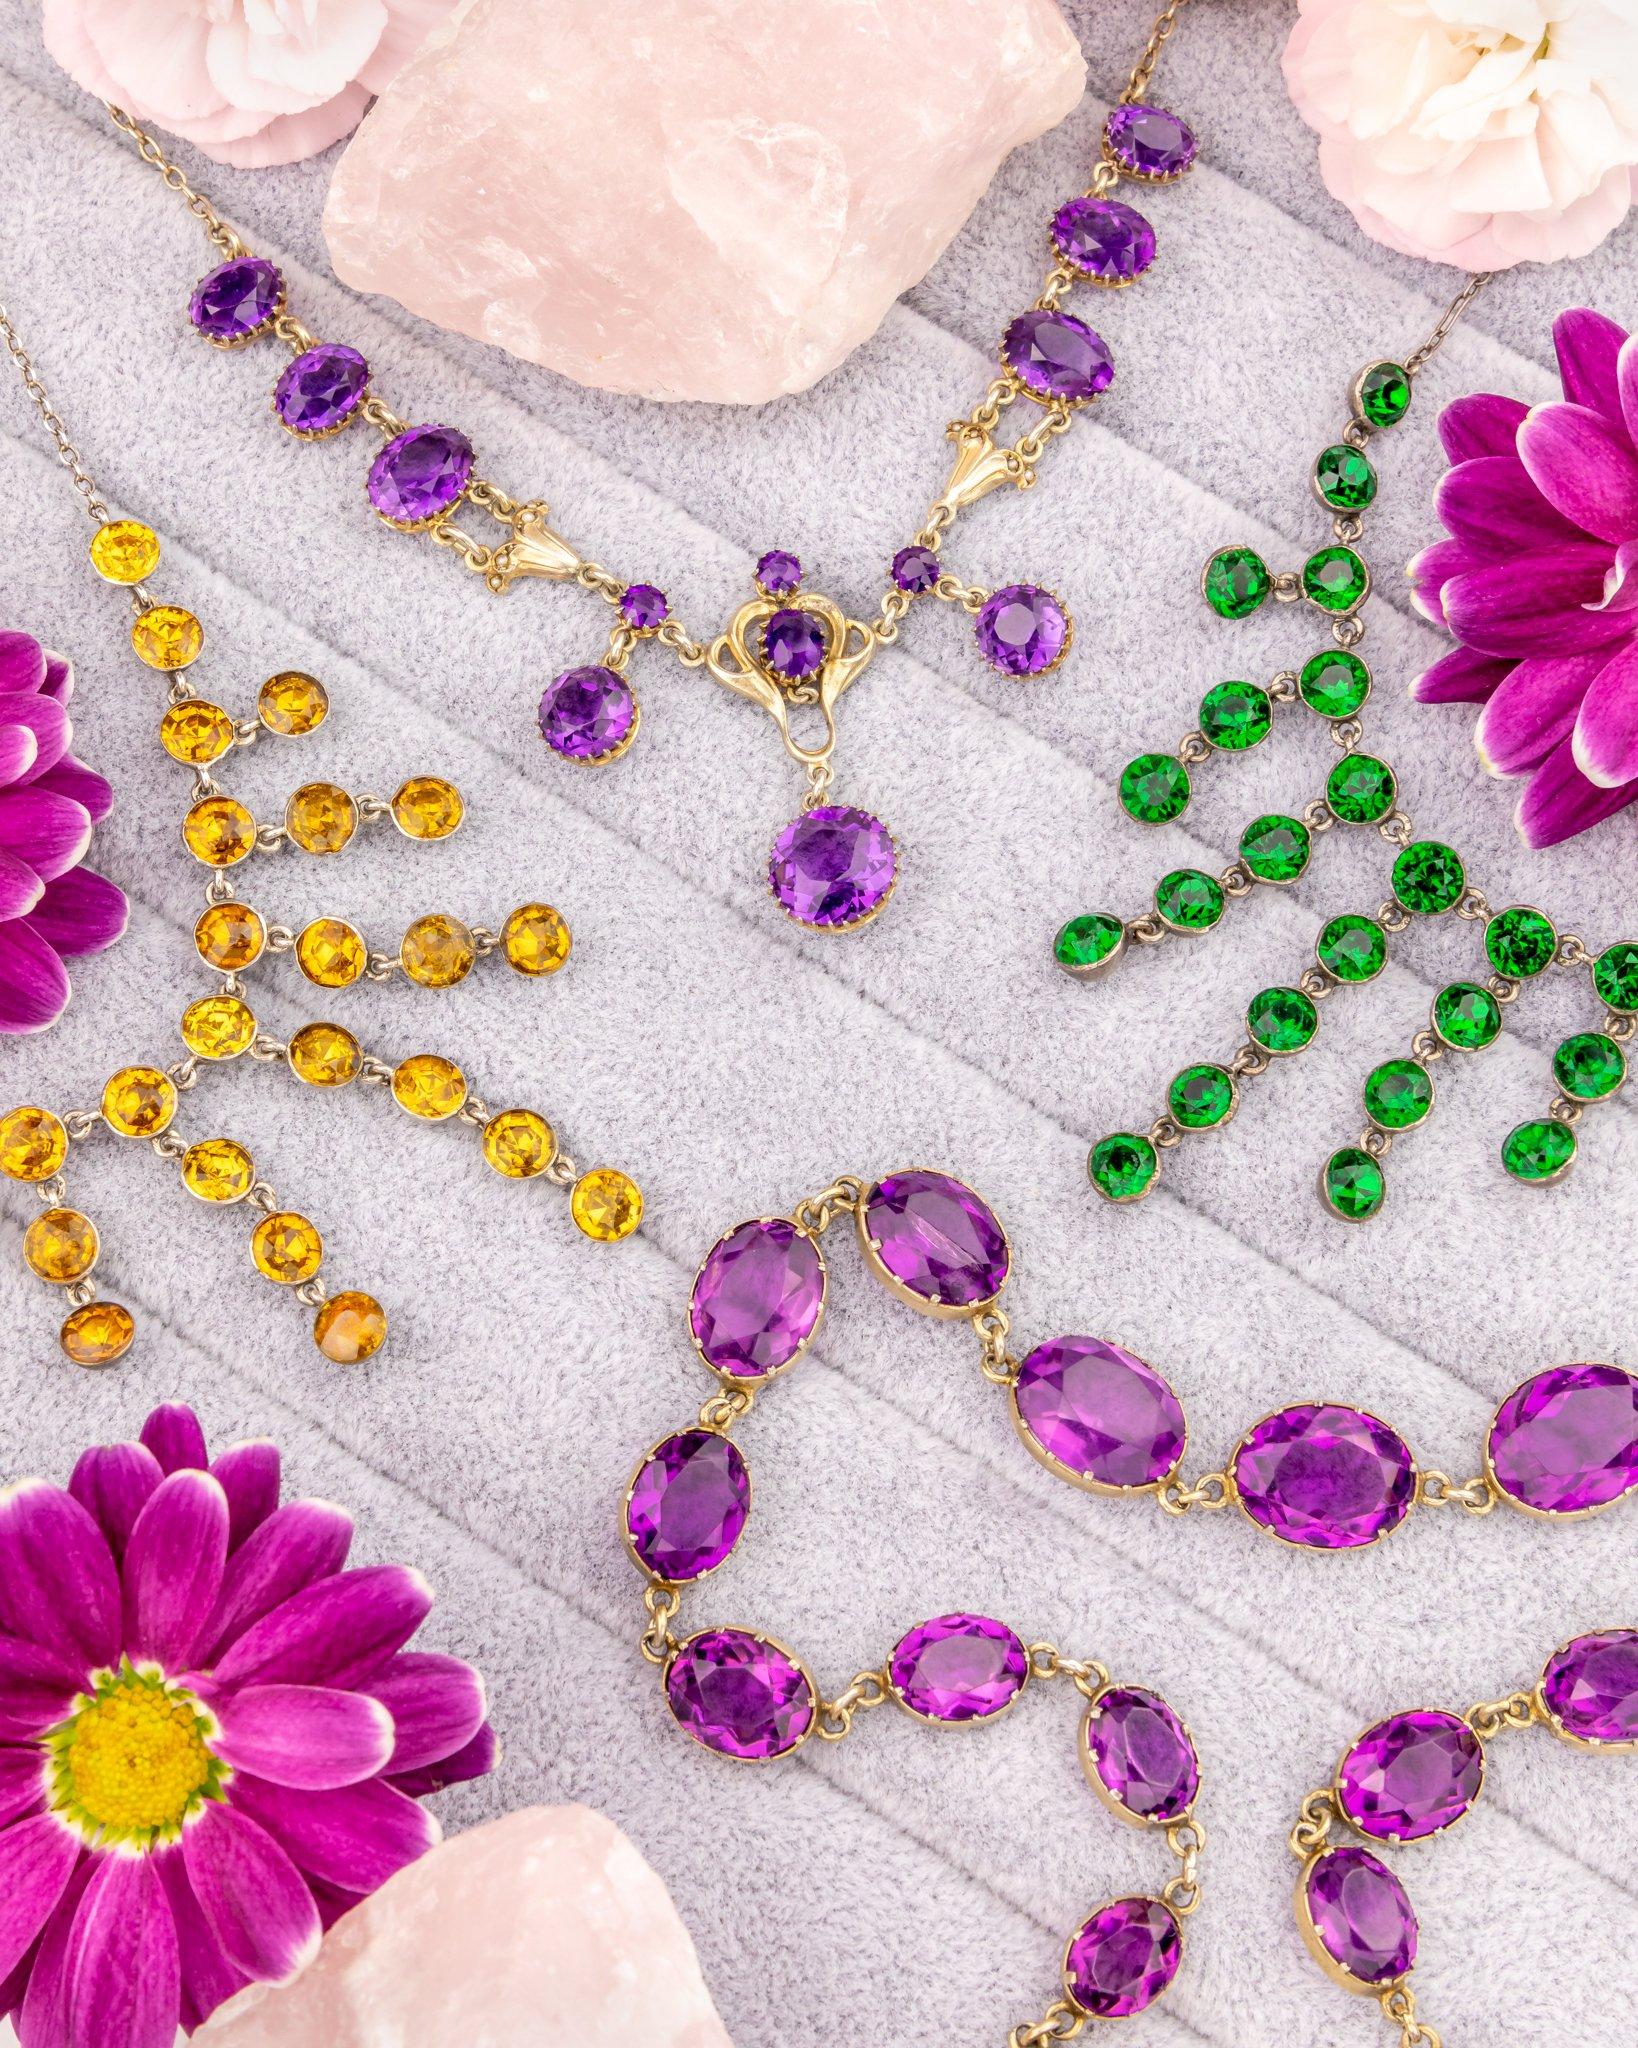 Costume Jewellery Market to Eyewitness Huge Growth by 2026 | Zara, Cartier, Yurman Design, BaubleBar, Buckley London, Billig Jewelers